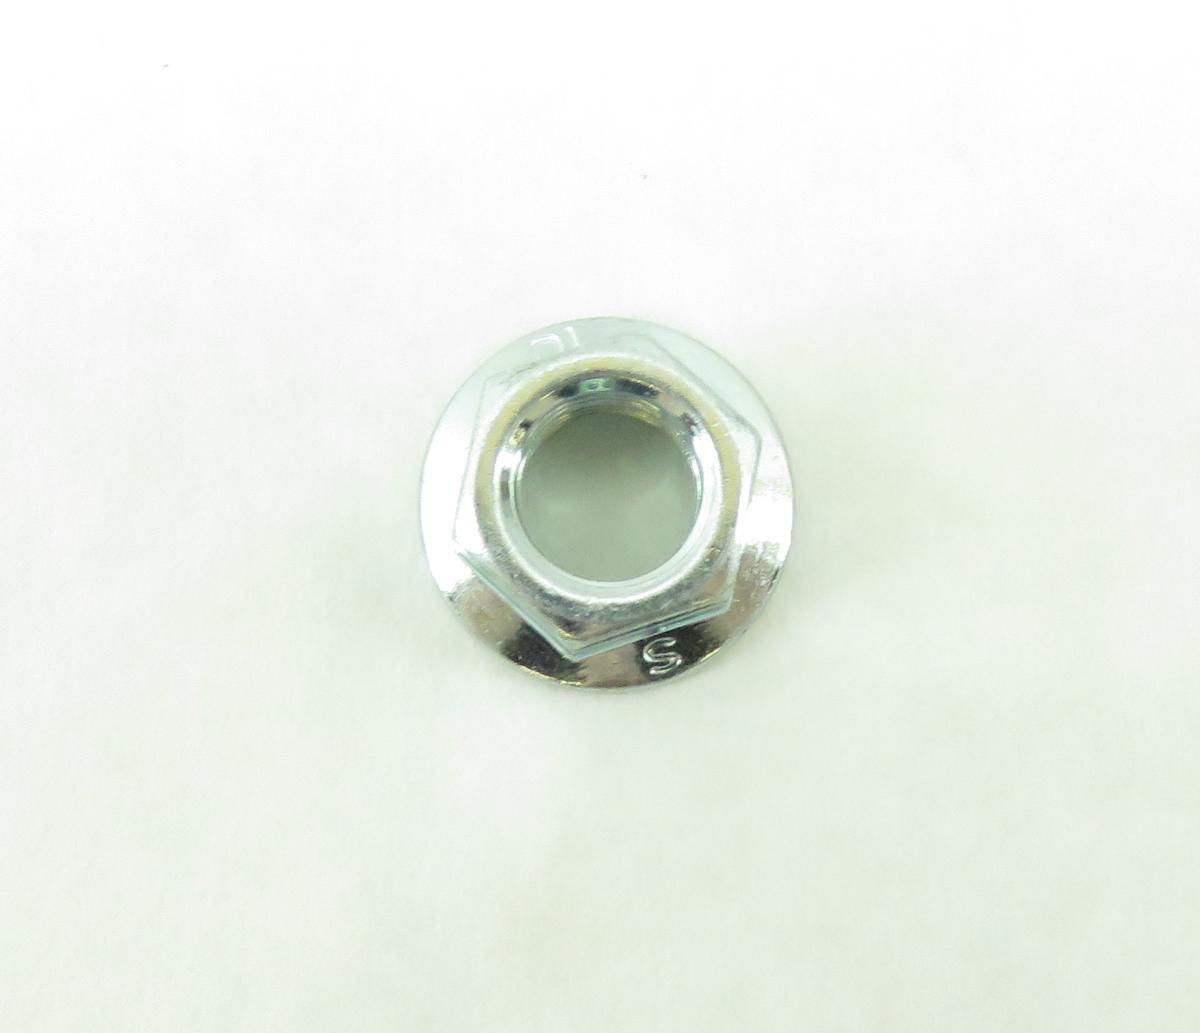 Standard Flywheel Nut Trc 2517 Electrical Pit Bike Engine Z50 Wiring Harness Parts Tbolt Usa Llc